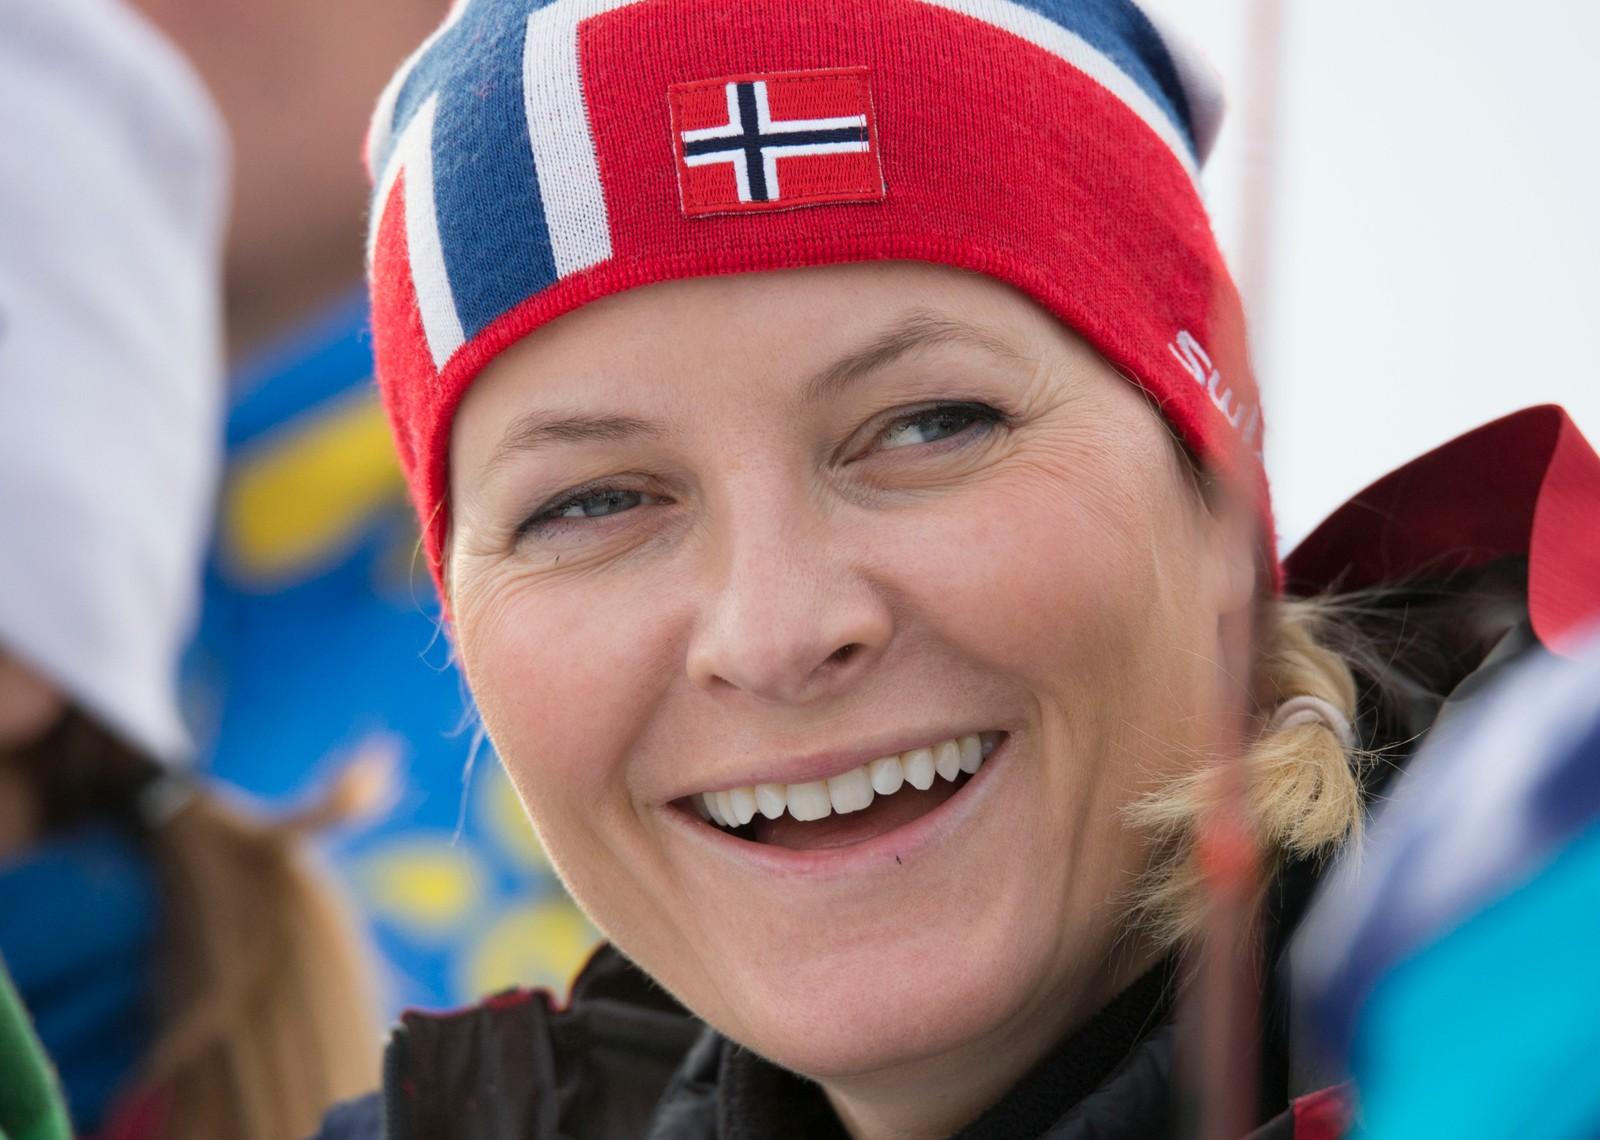 Kronprinsfamilien på Birkebeineren skistadion i forbindelse med at de møtte flyktninger som skal lære å gå på ski. Her kronprinsesse Mette-Marit.